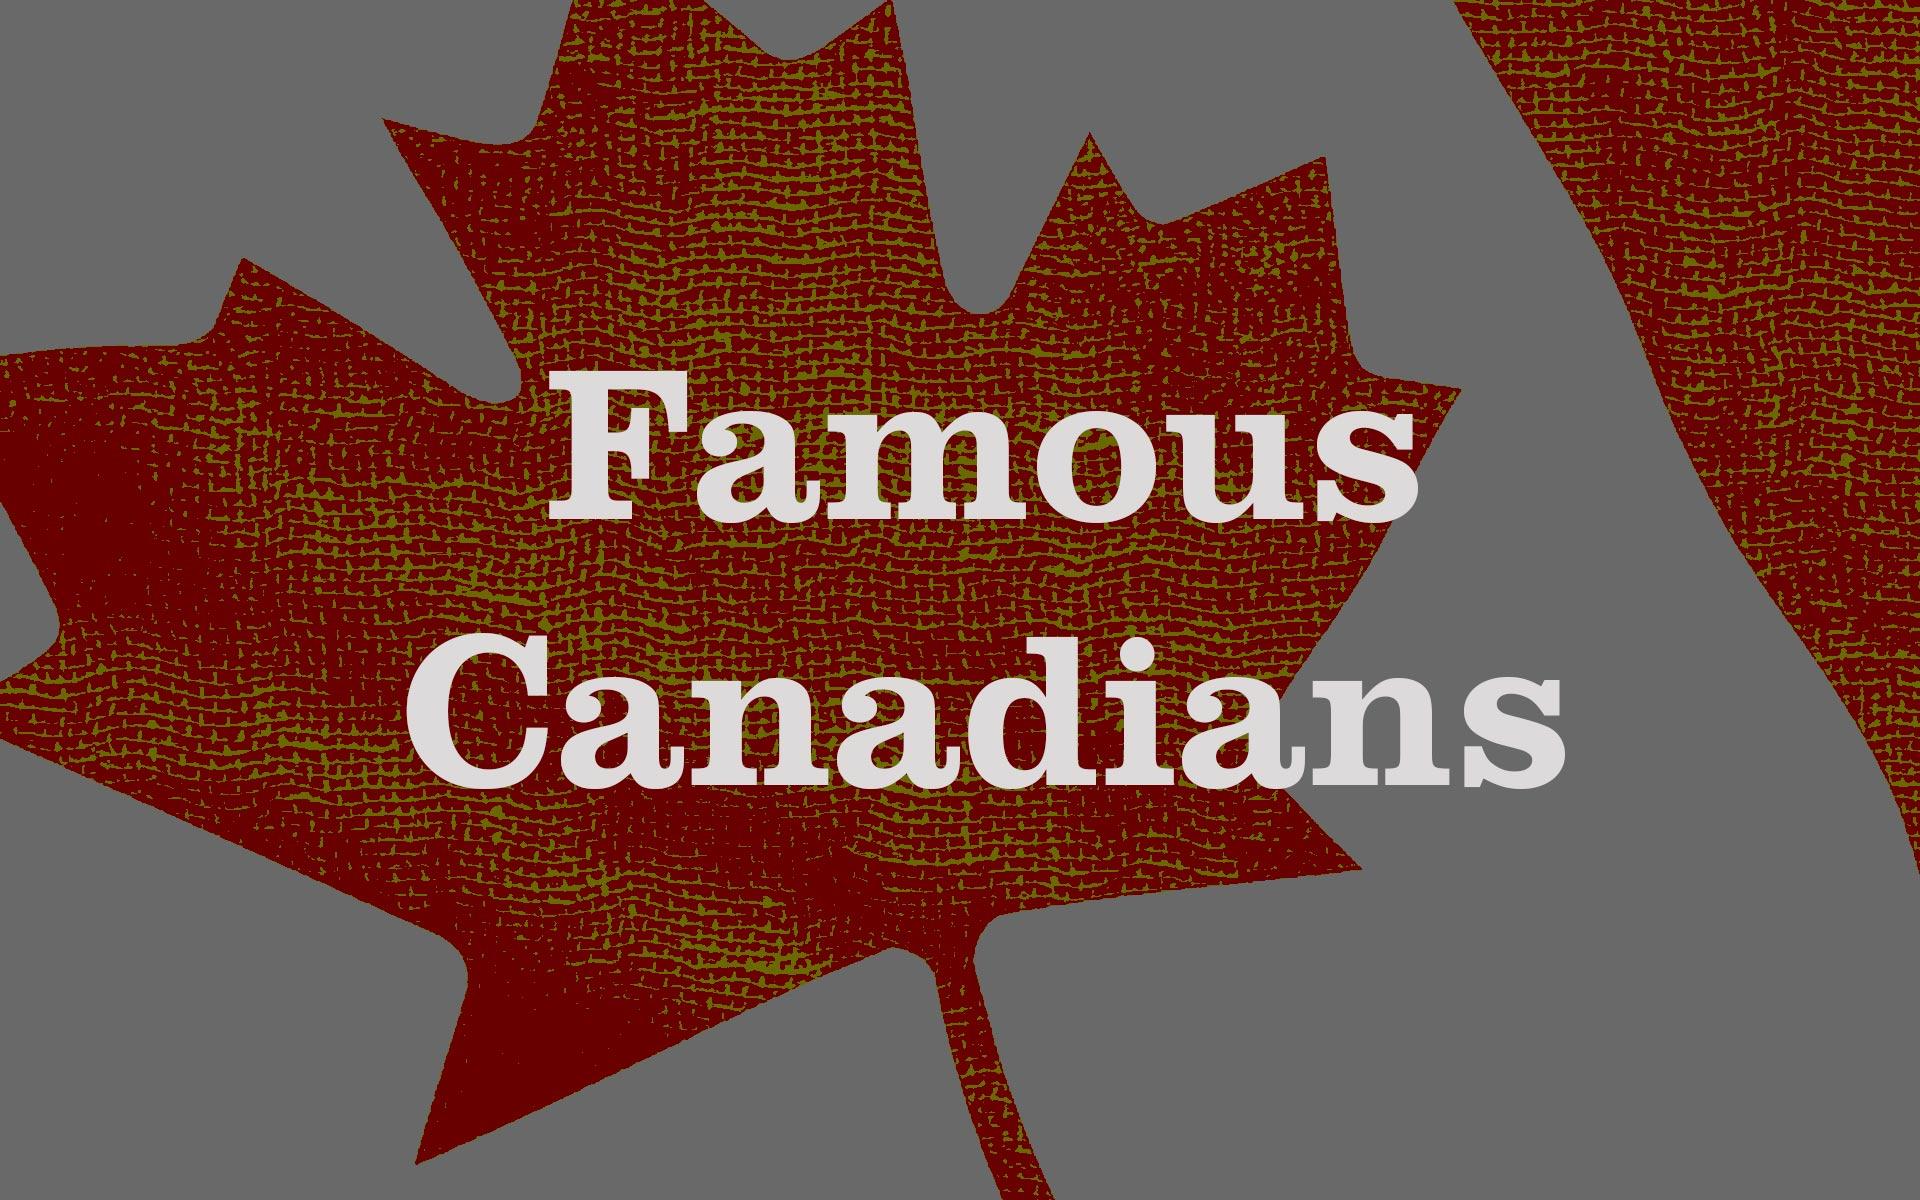 Canada 150 - Parliament buildings and leaf logo